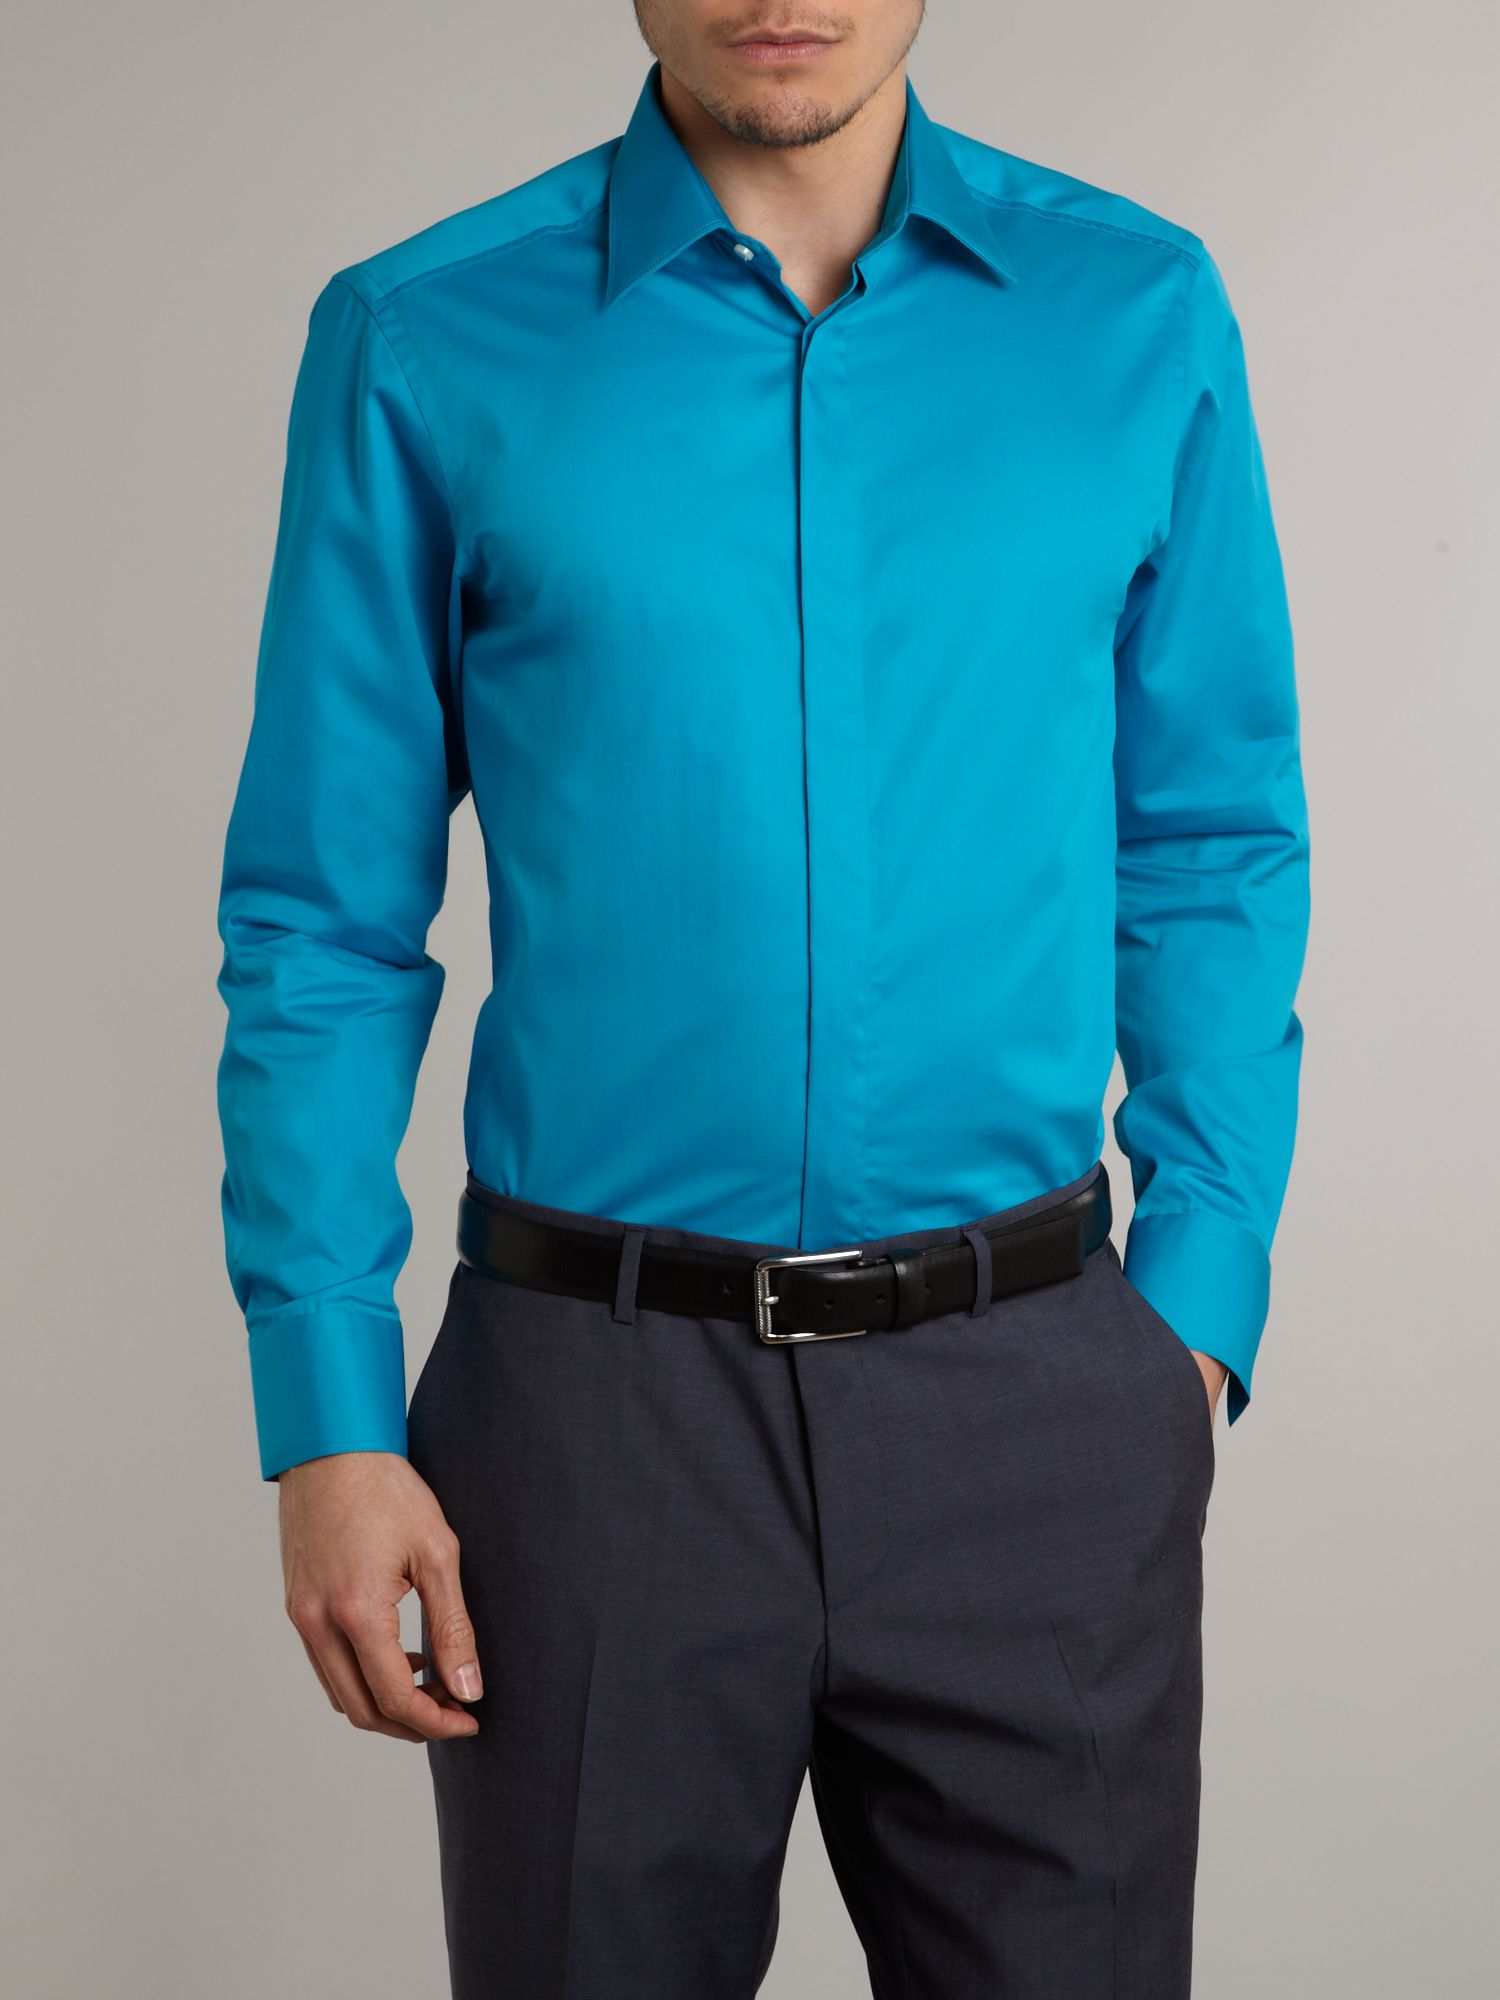 how to wear a plain black long sleeve shirt